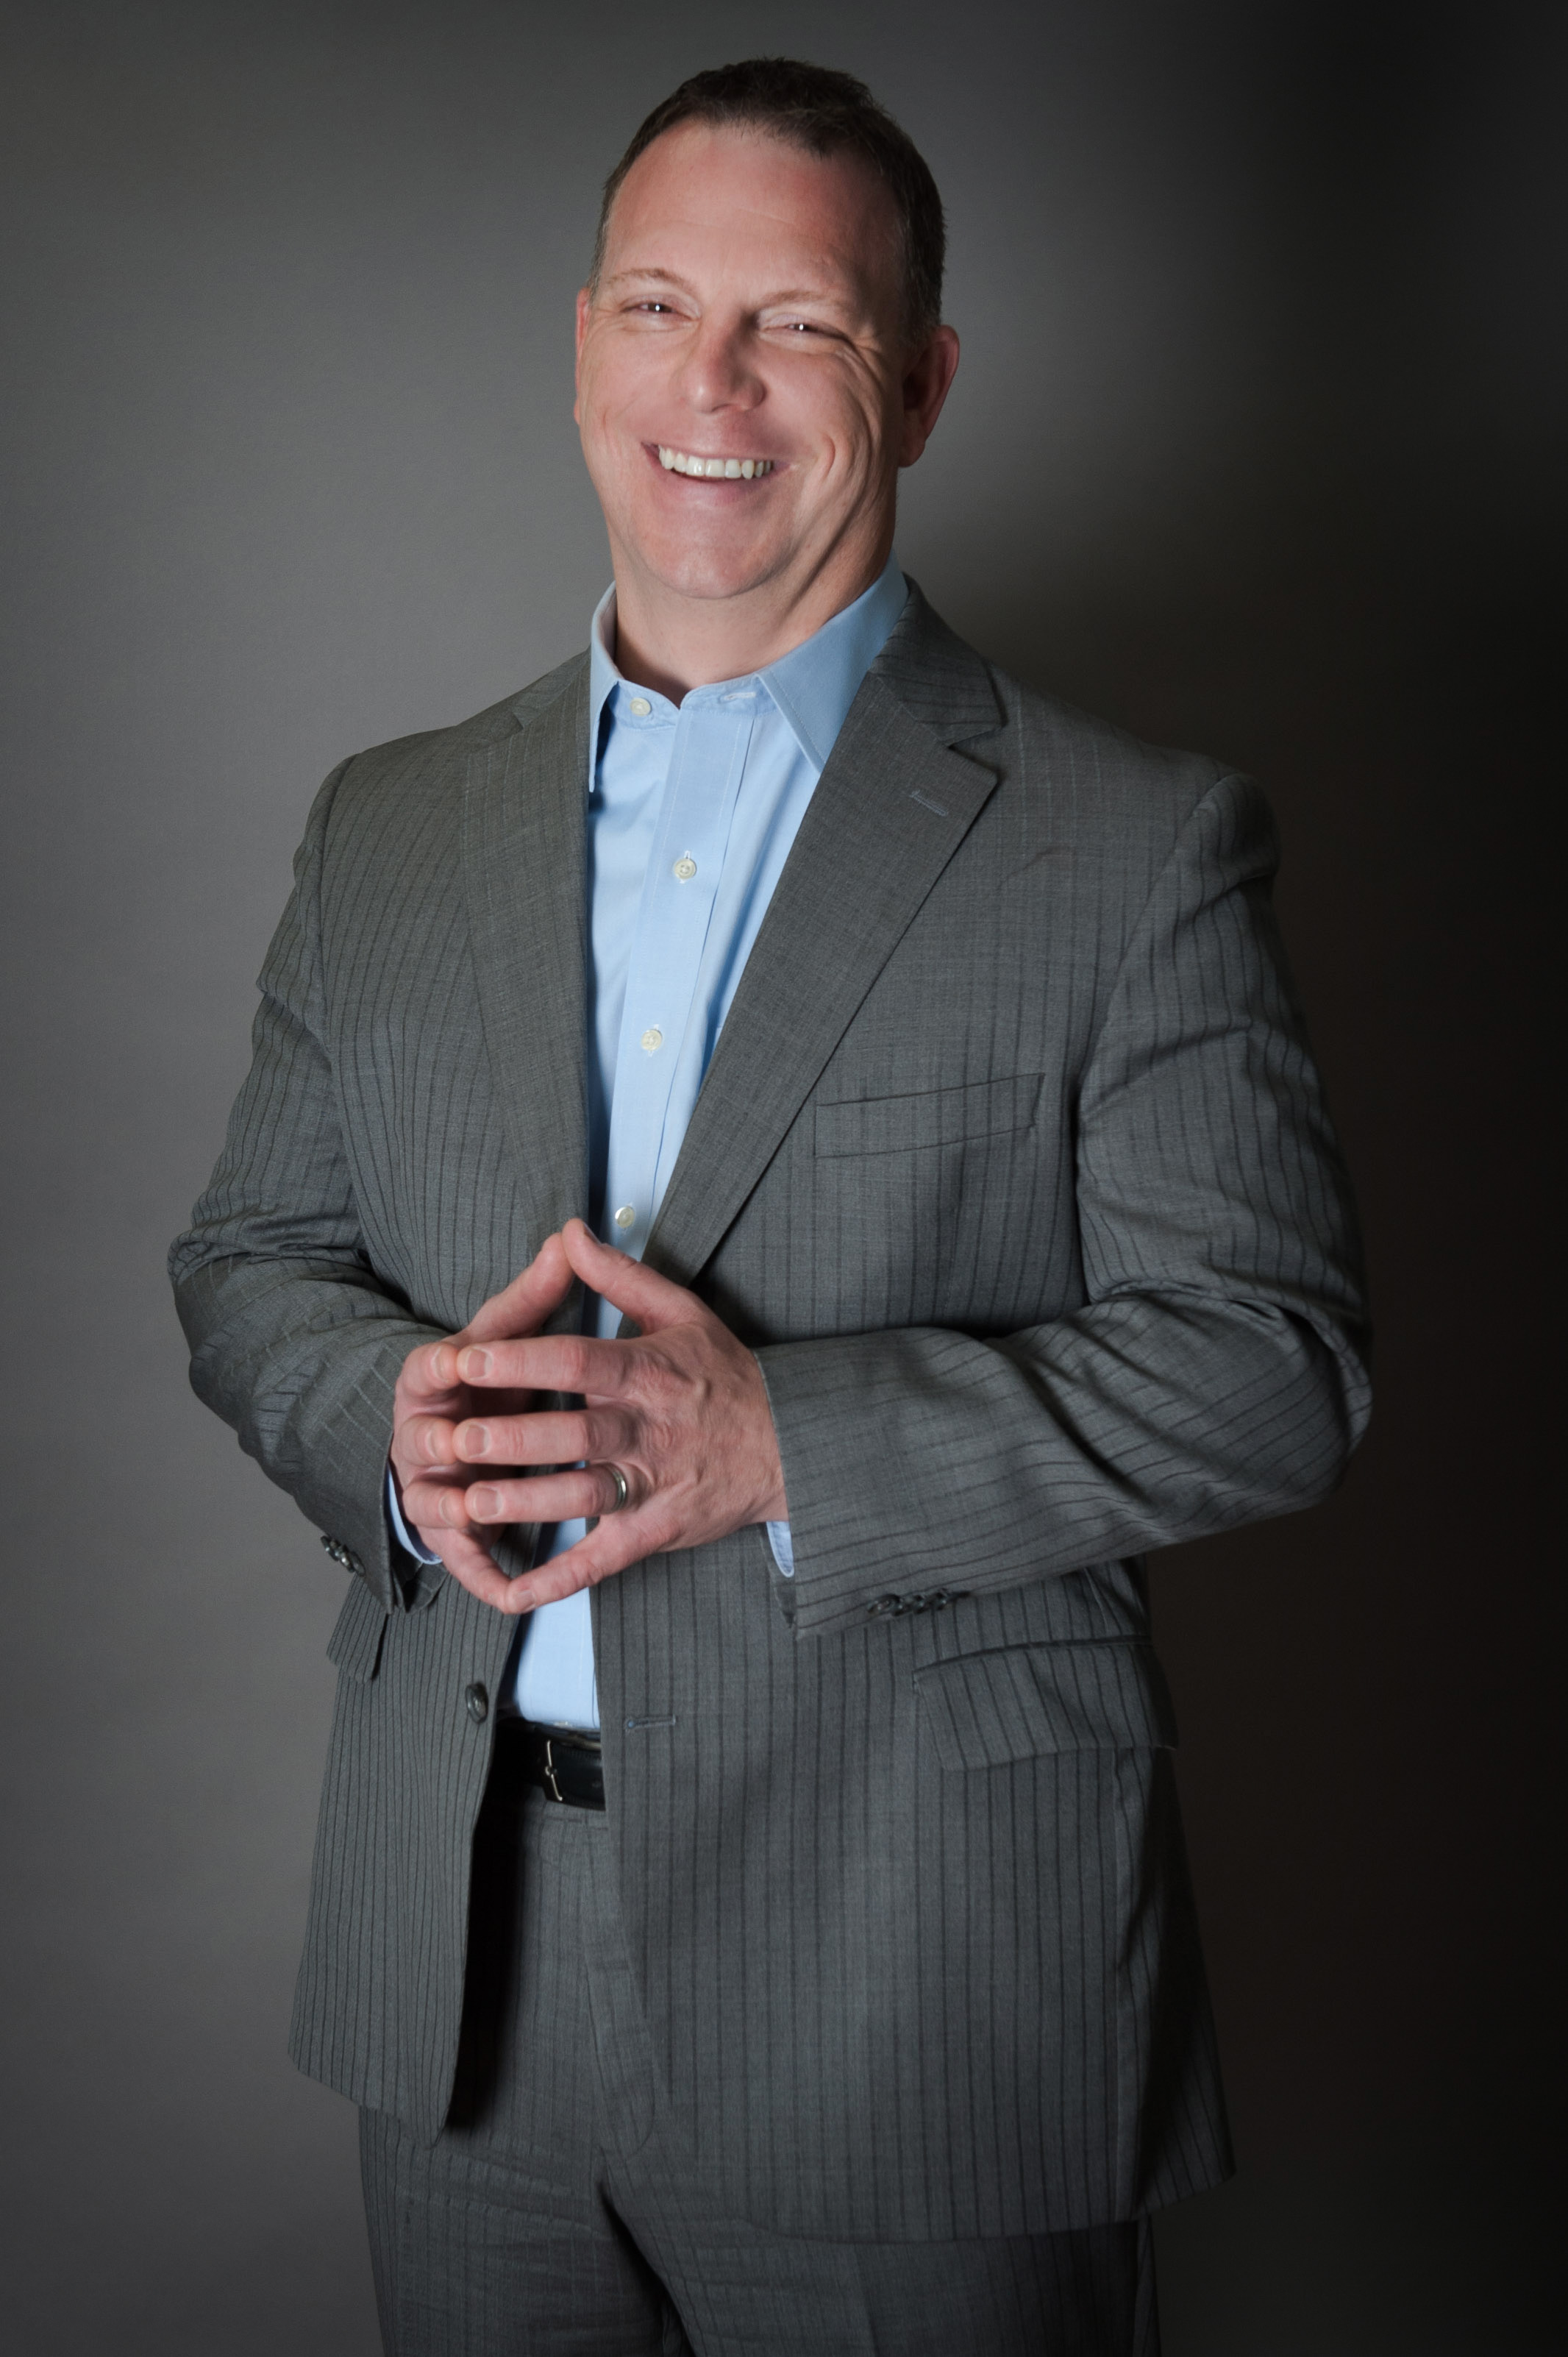 Jeff Engelman